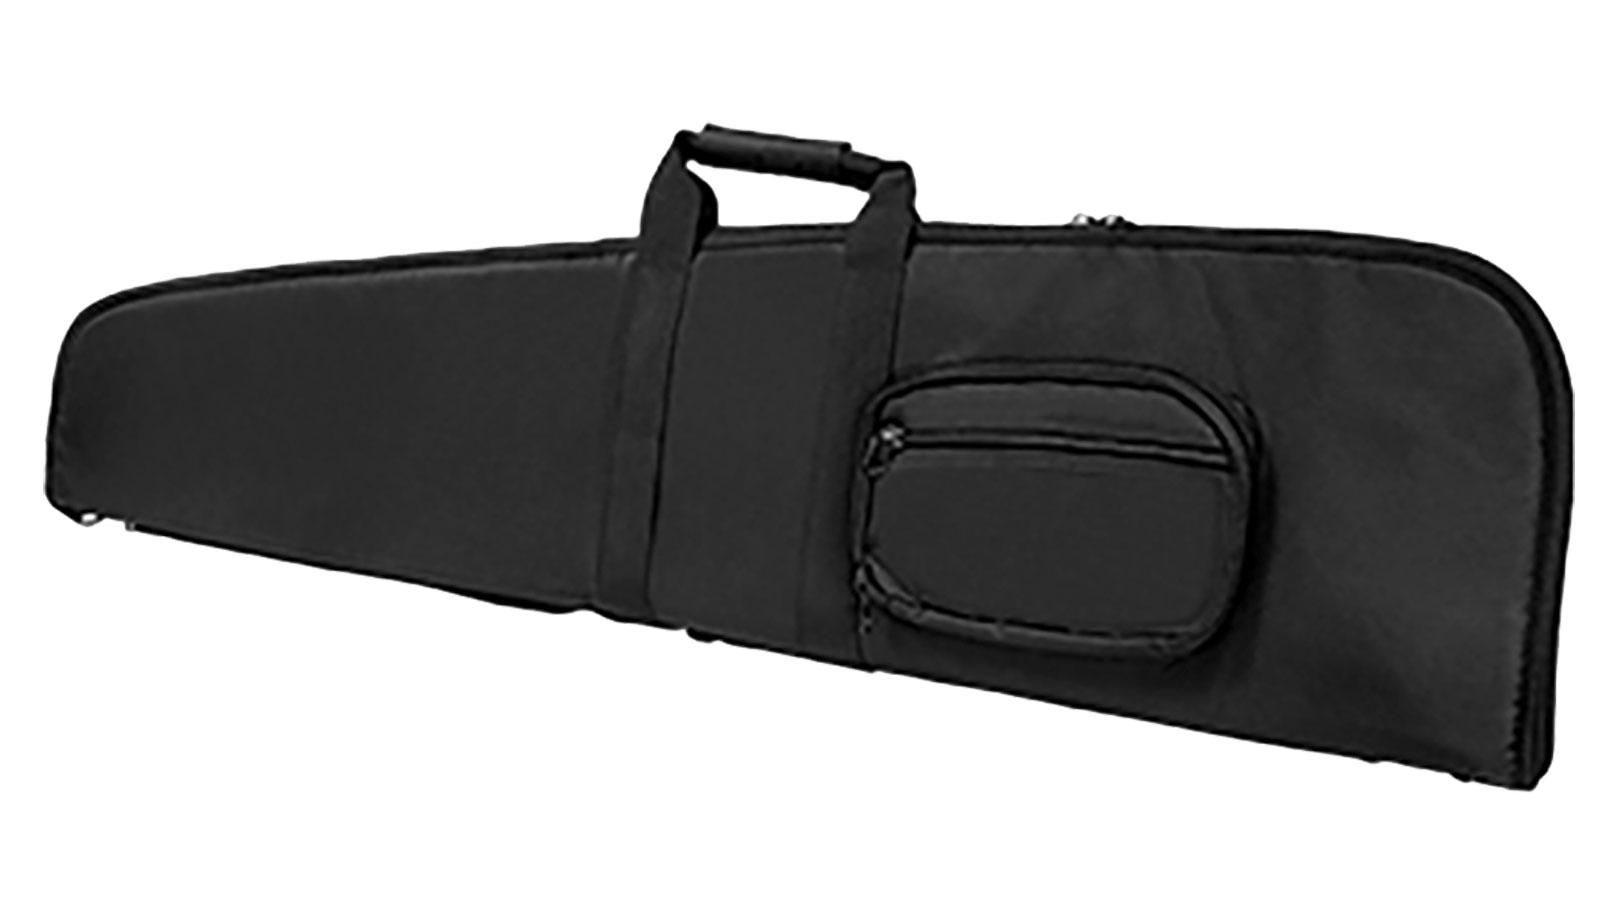 NcStar CVS290652 Scope-Ready Rifle Case 52 Foam-Lined PVC Tactical Nylon Black in.